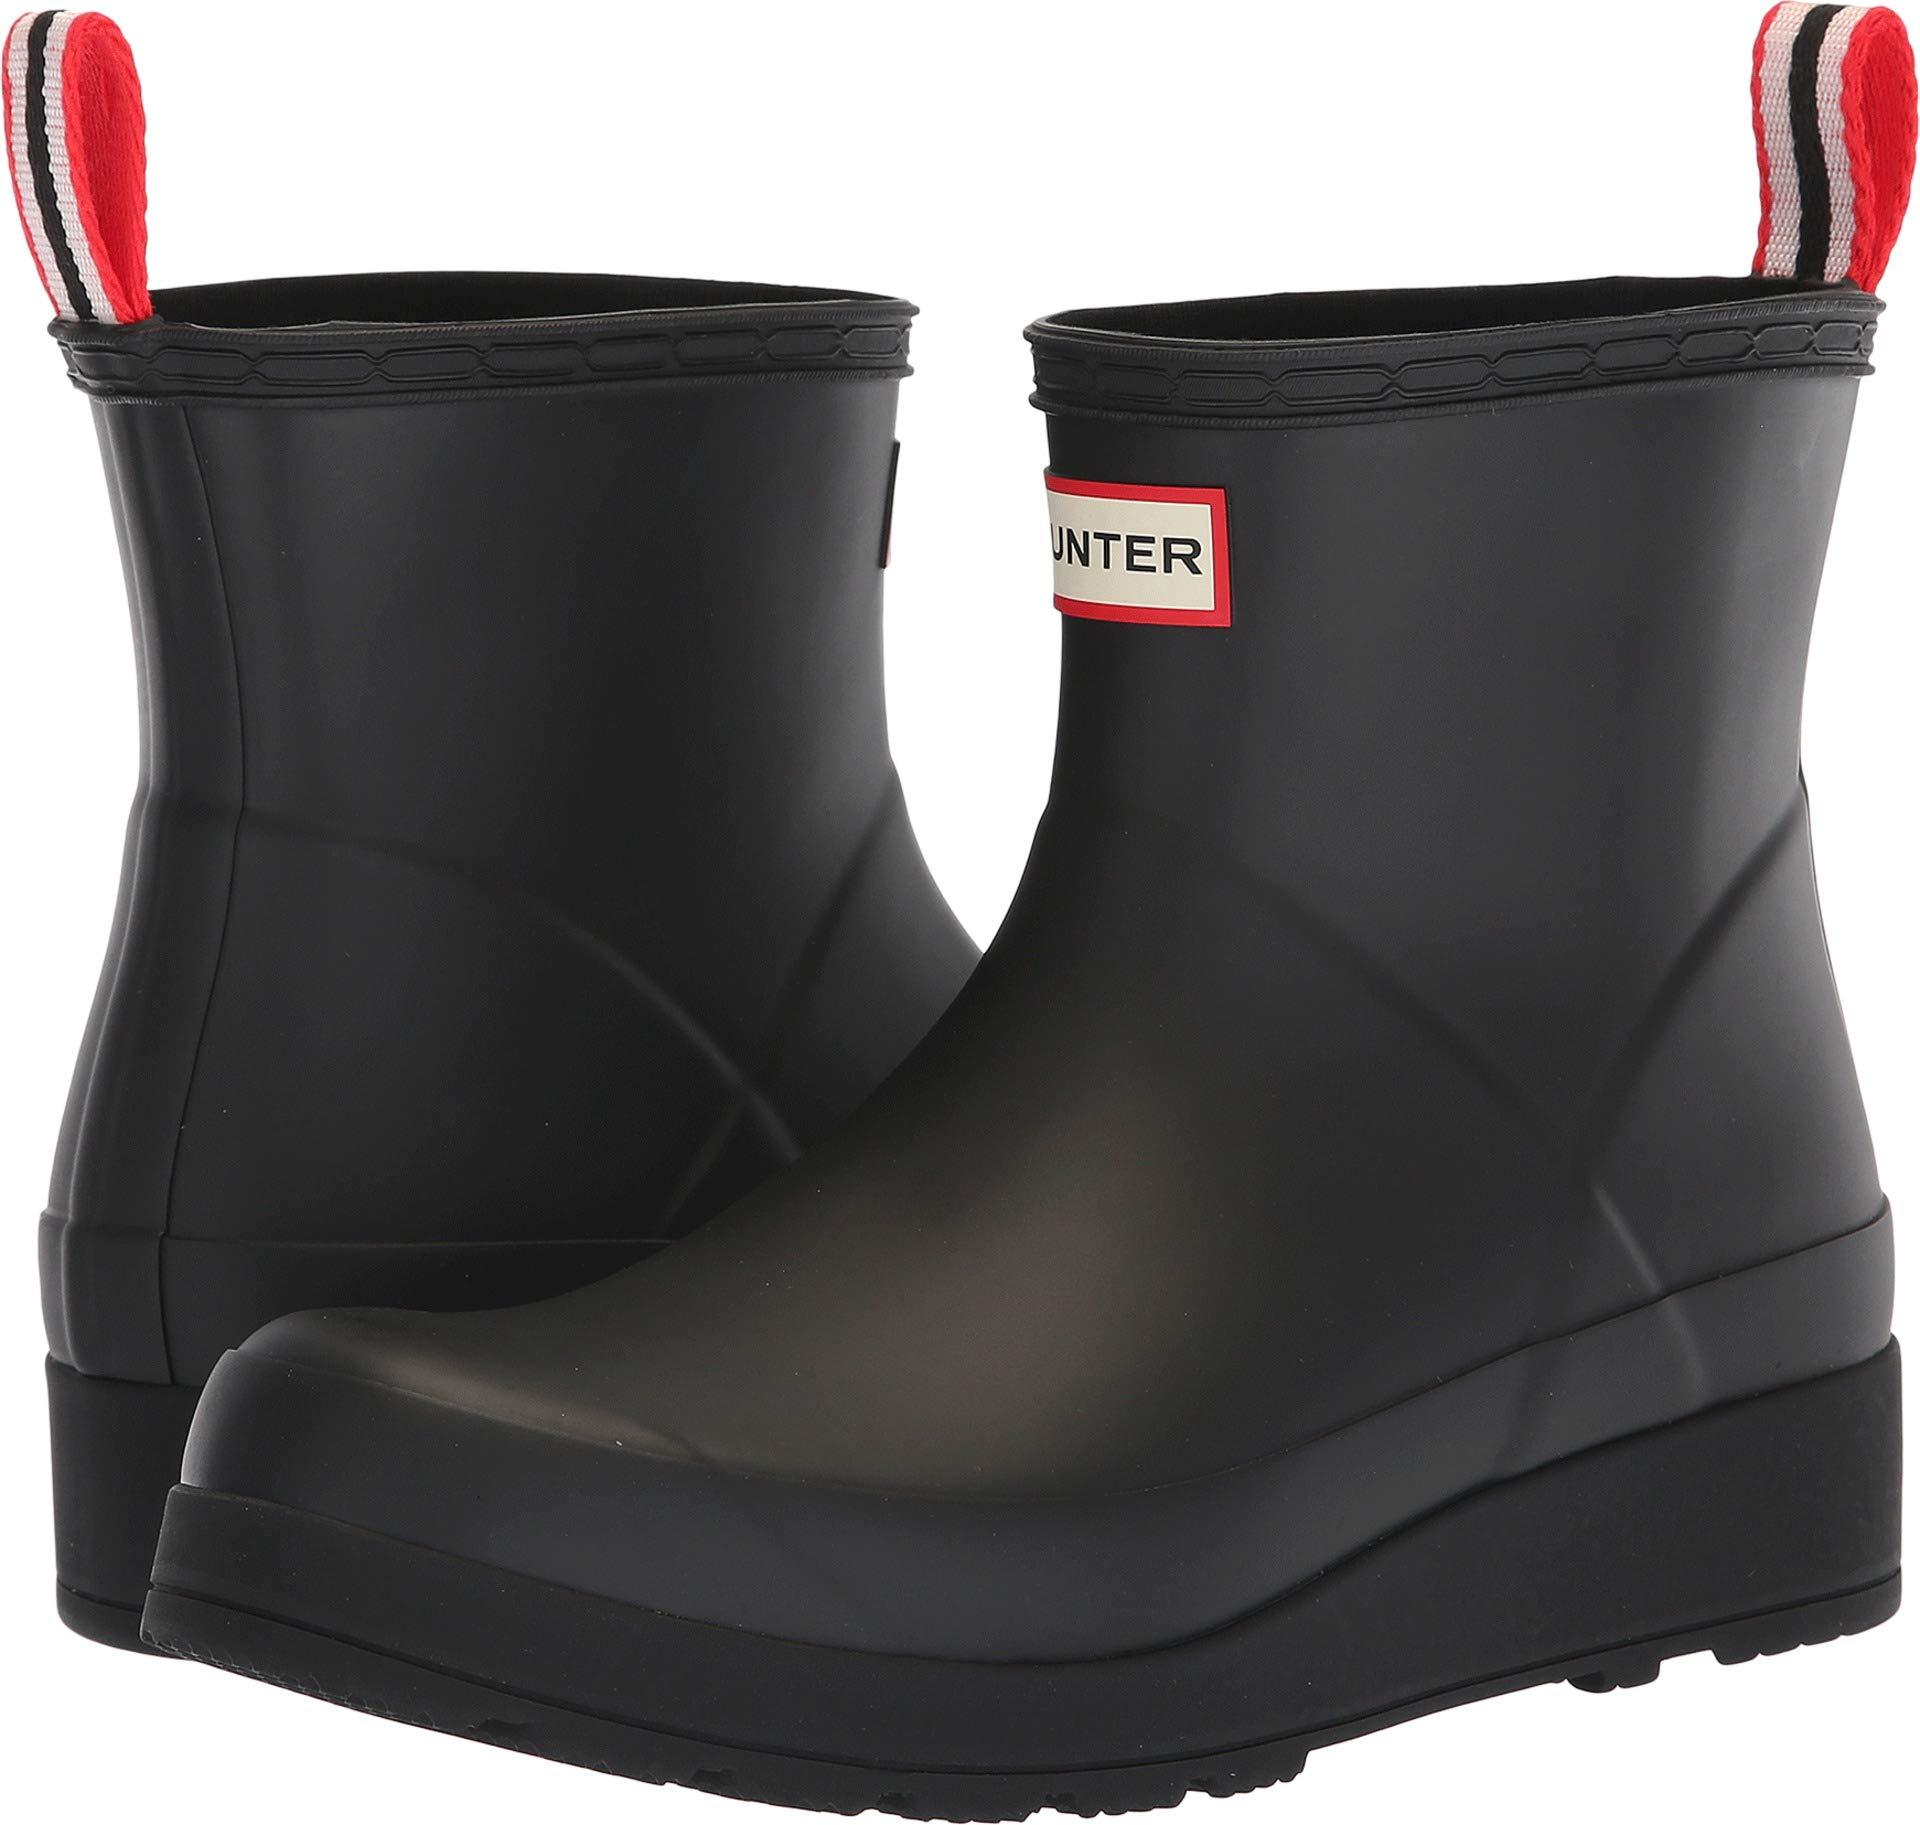 Hunter Women's Original Play Boot Short Rain Boots Black 8 M US by Hunter